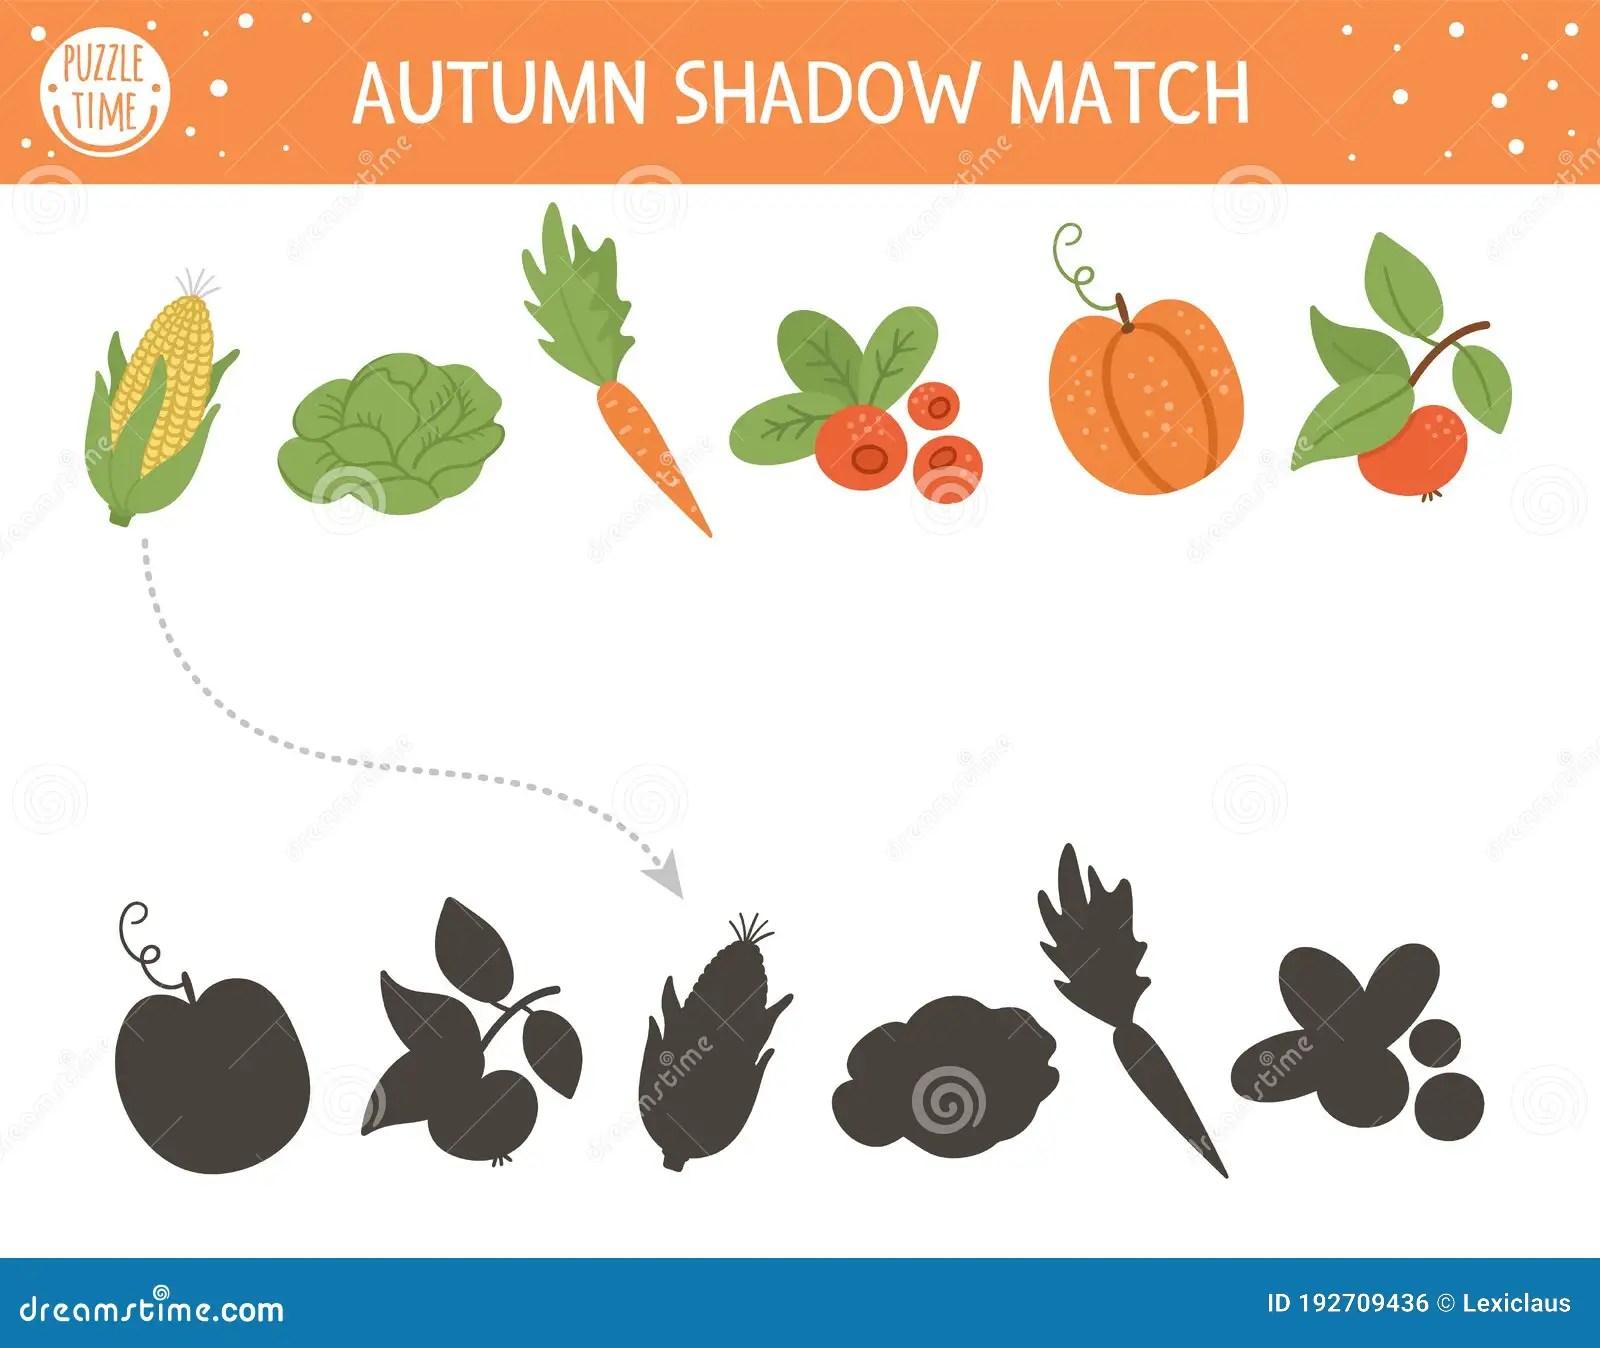 Autumn Shadow Matching Activity For Children Fall Season